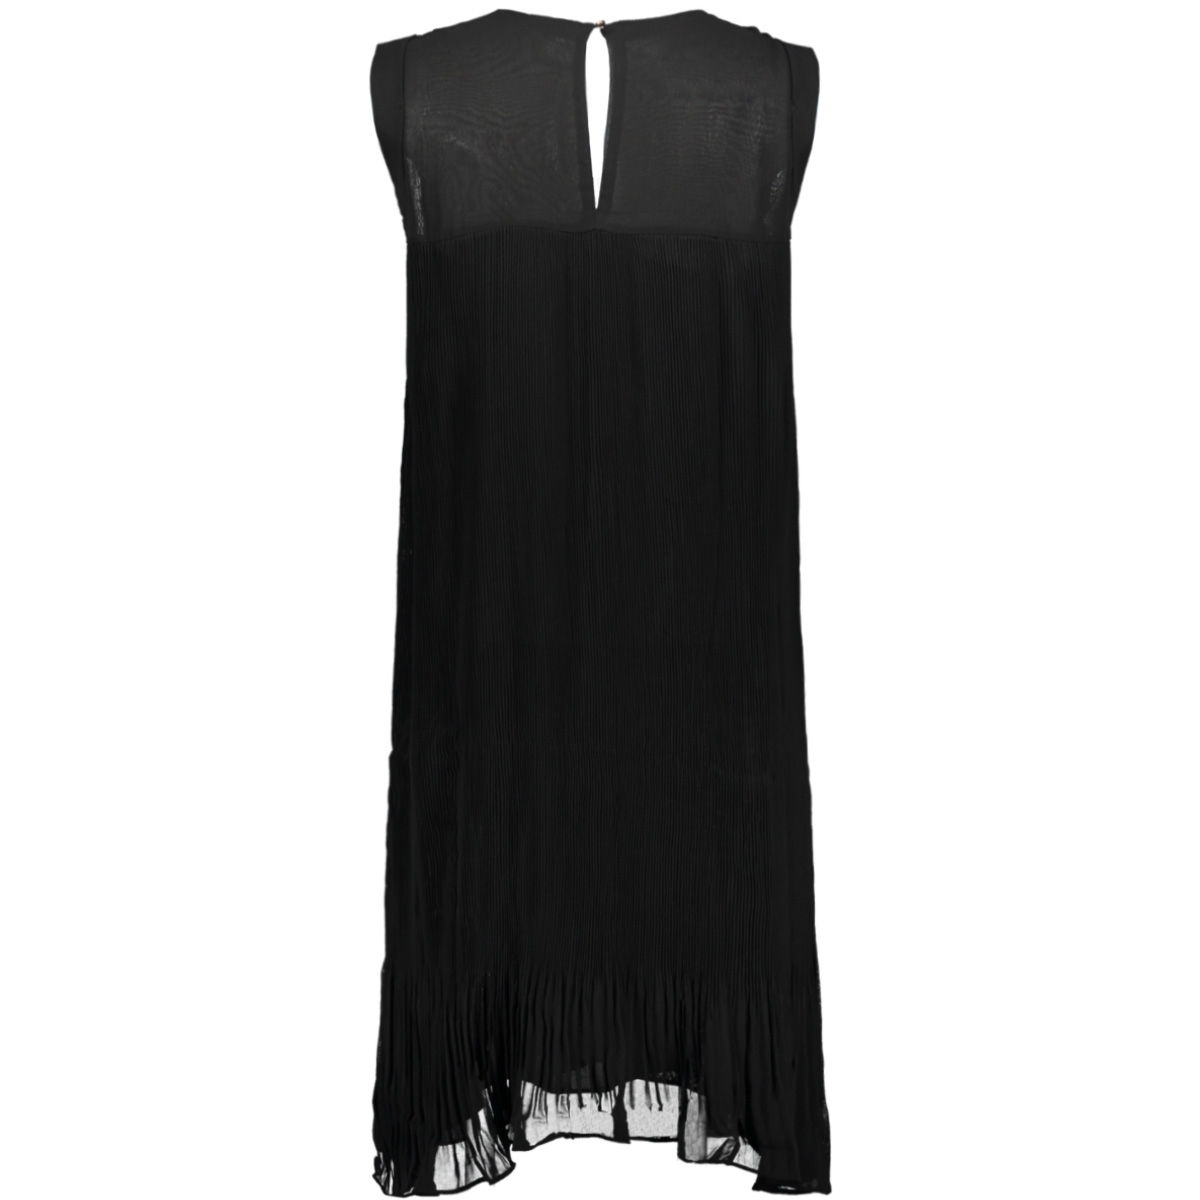 woven dress above knee u6003 30501606 saint tropez jurk 0001